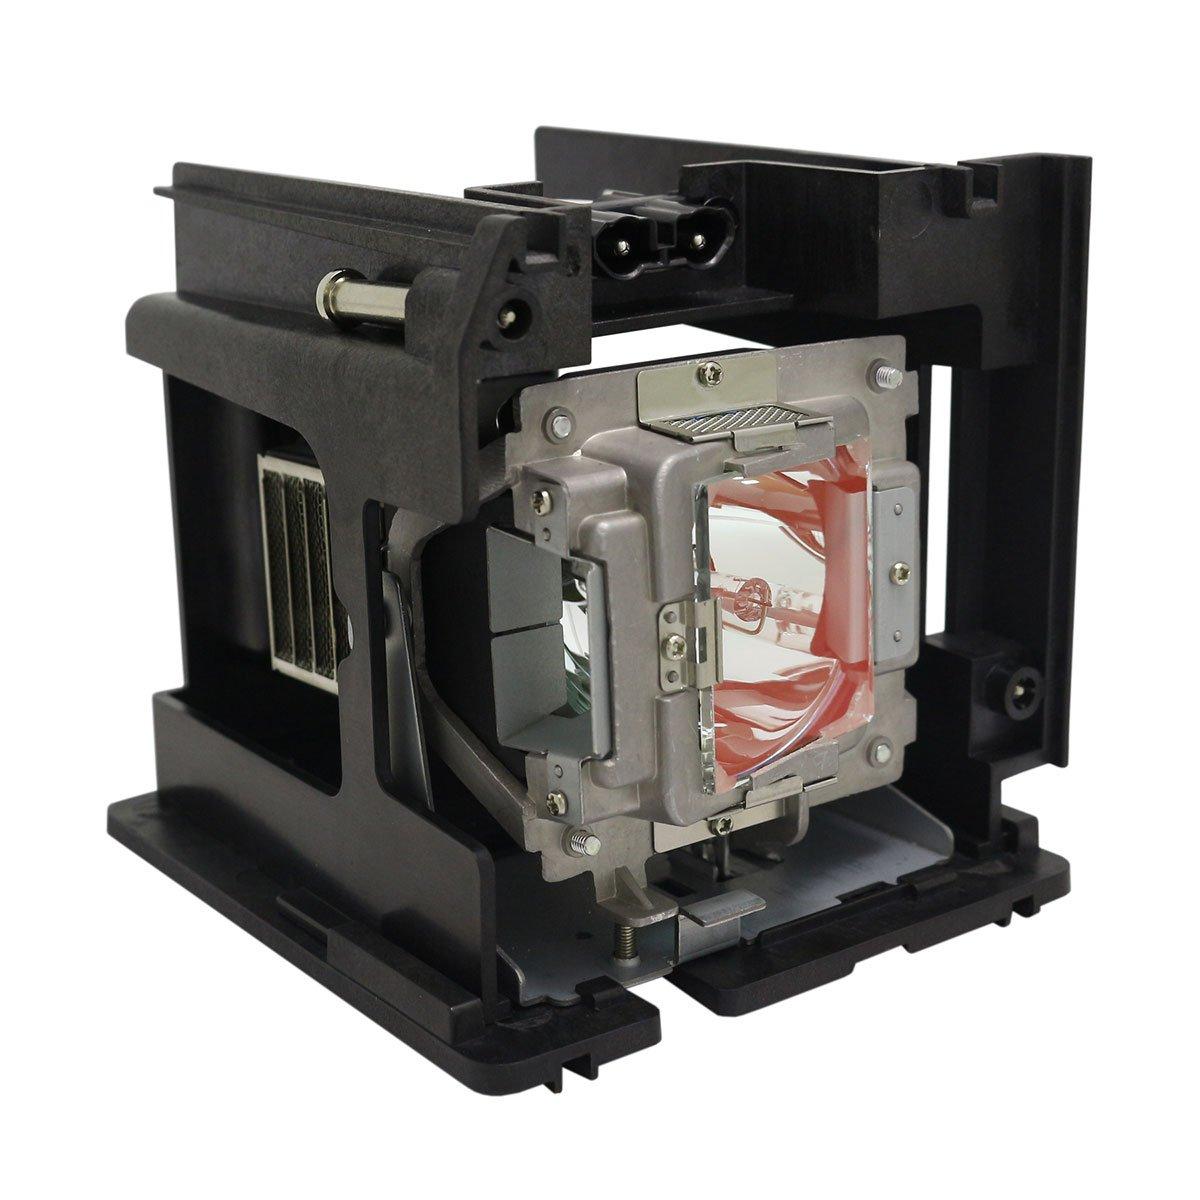 SpArc Platinum for Vivitek 5811118452-SVV Projector Lamp with Enclosure by Sparc Bulbs (Image #2)